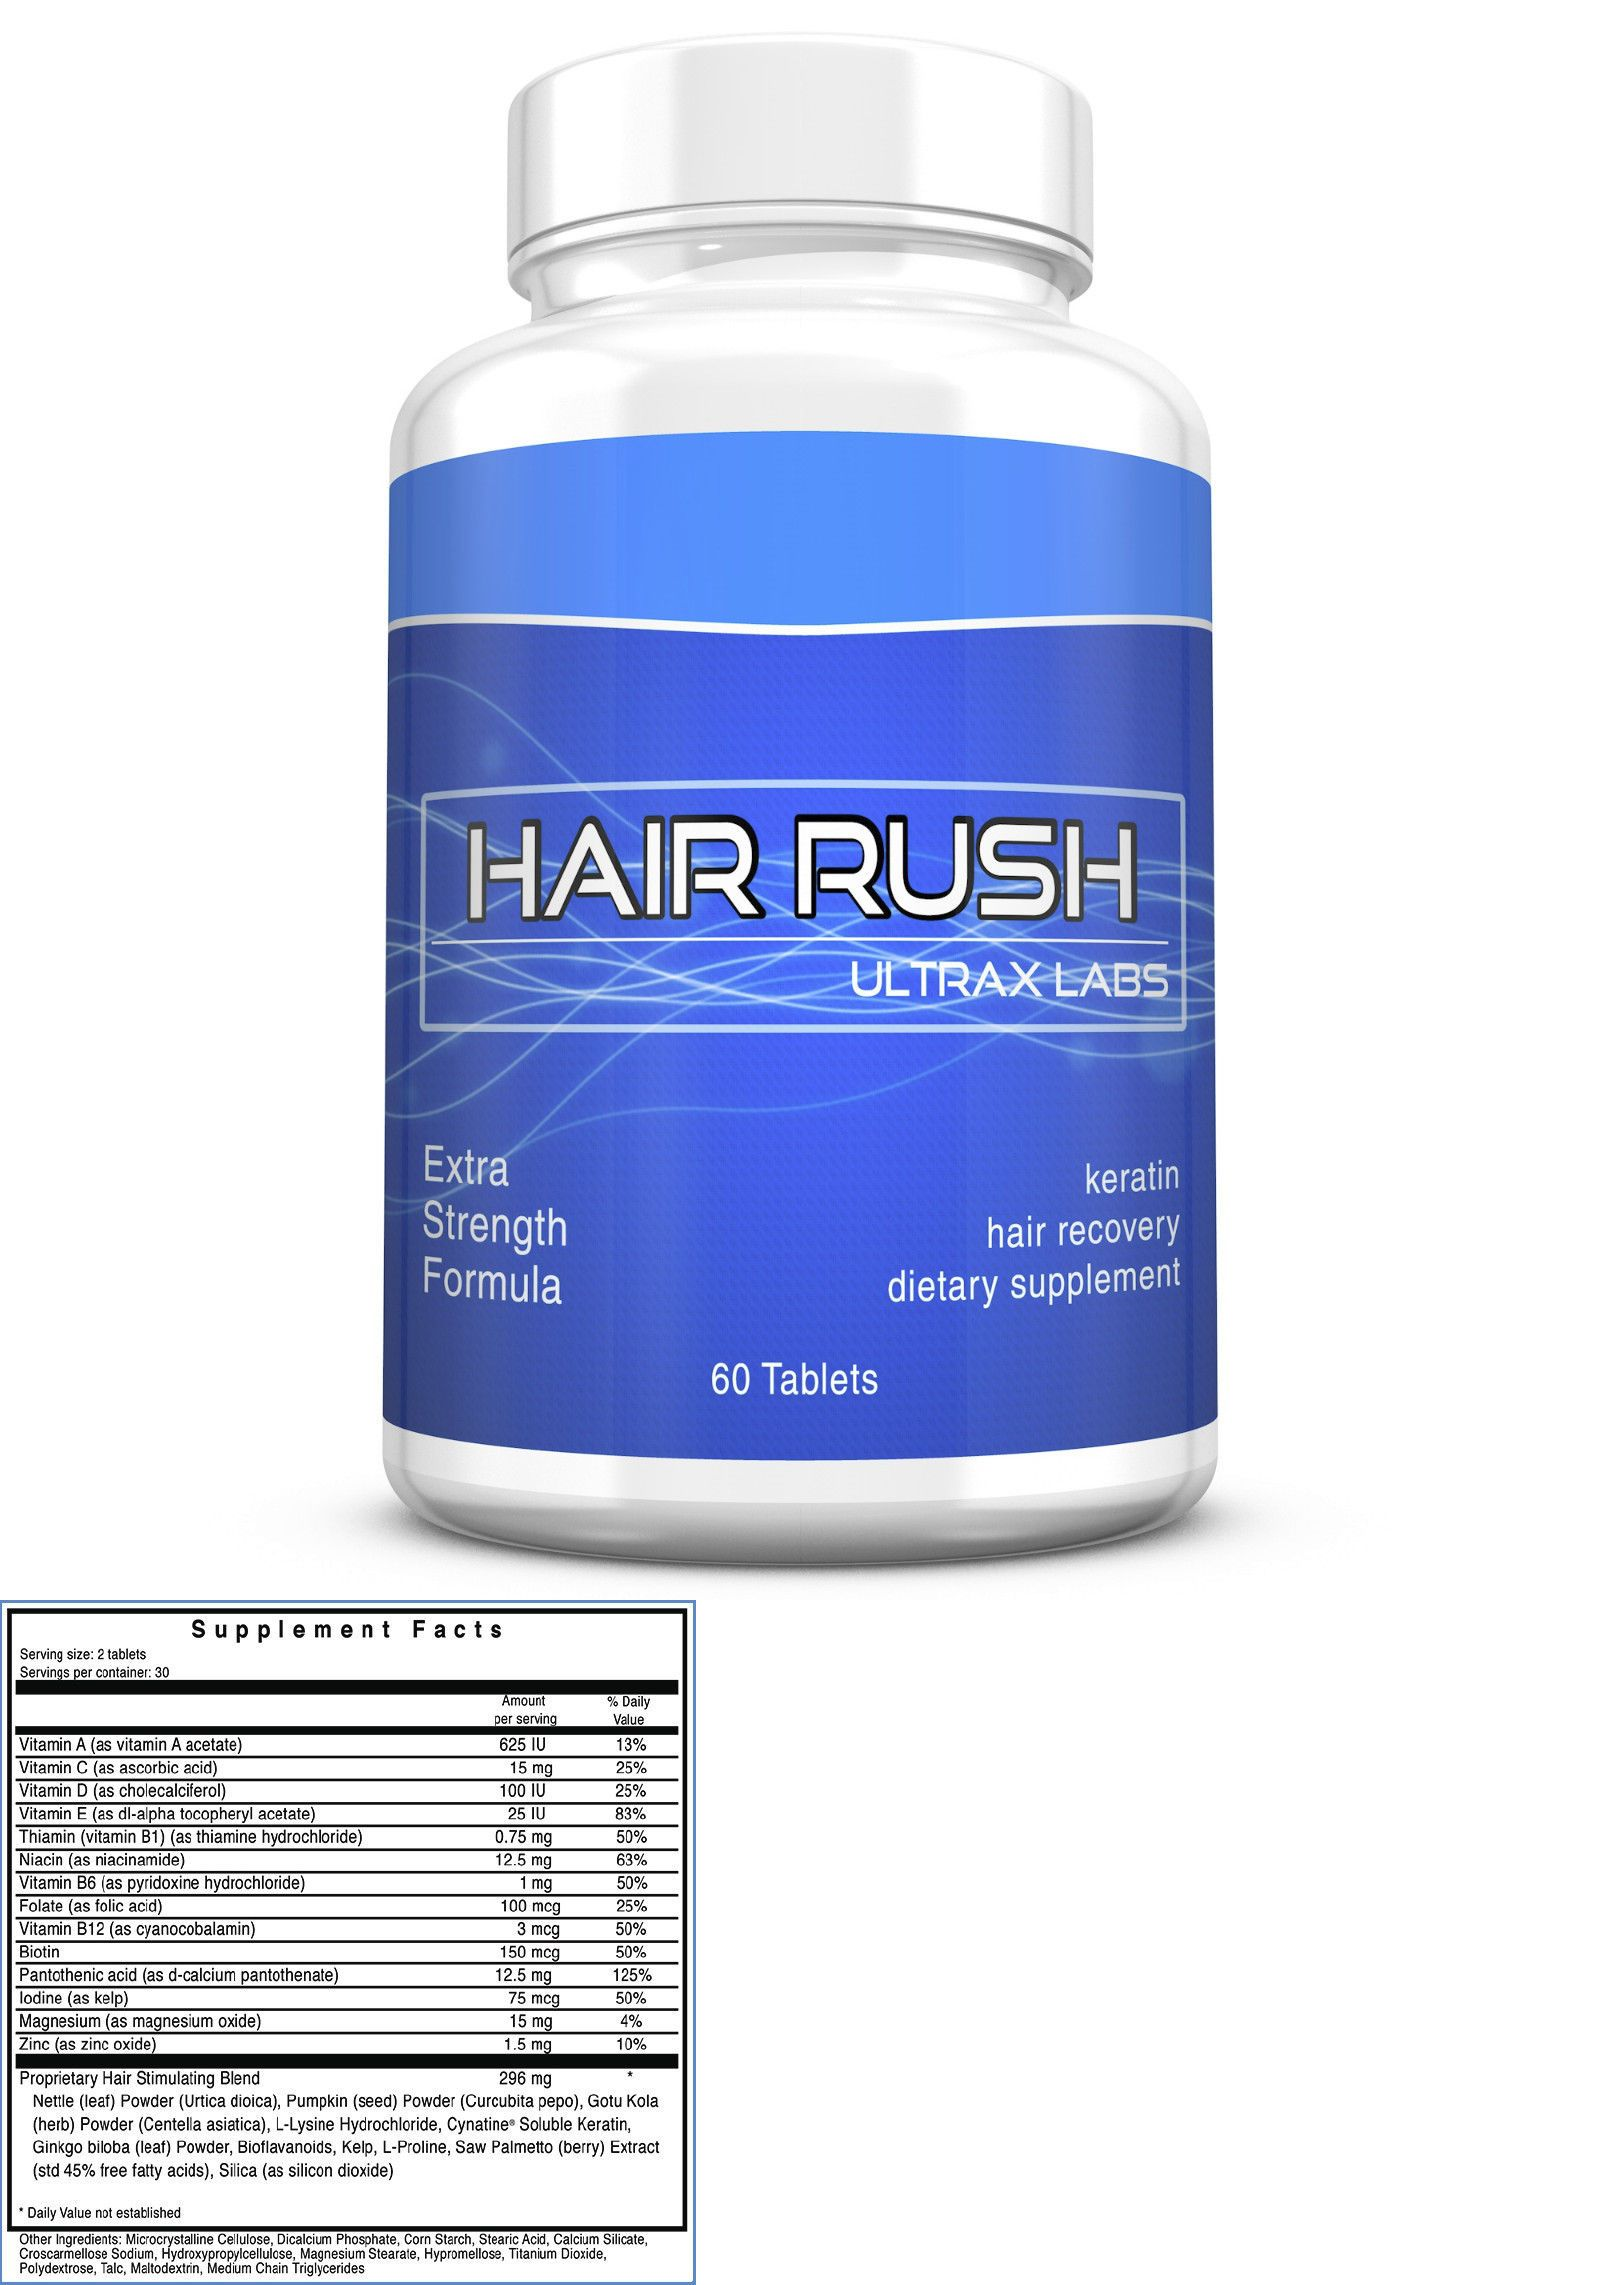 Ultrax Labs Hair Rush Grow Your To The Maxx Loss Kaminomoto Tonic Supplement Treatments 31413 Pinterest